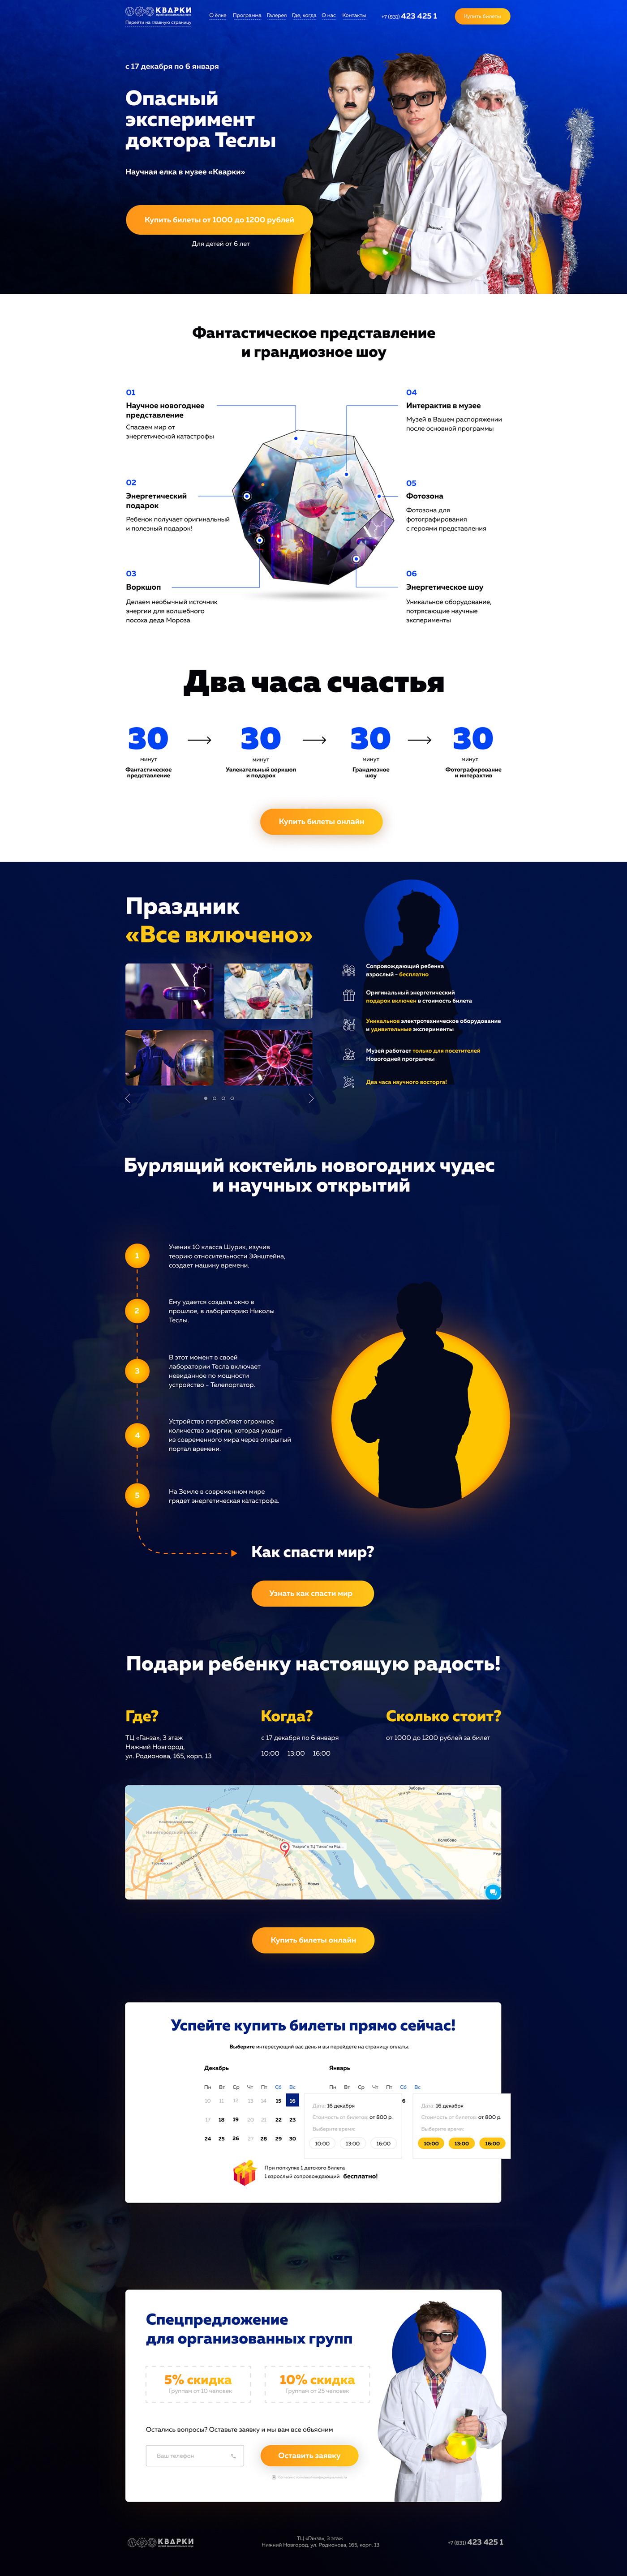 Web Design  landing page new year Christmas promo festival Santa Claus Ded Moroz